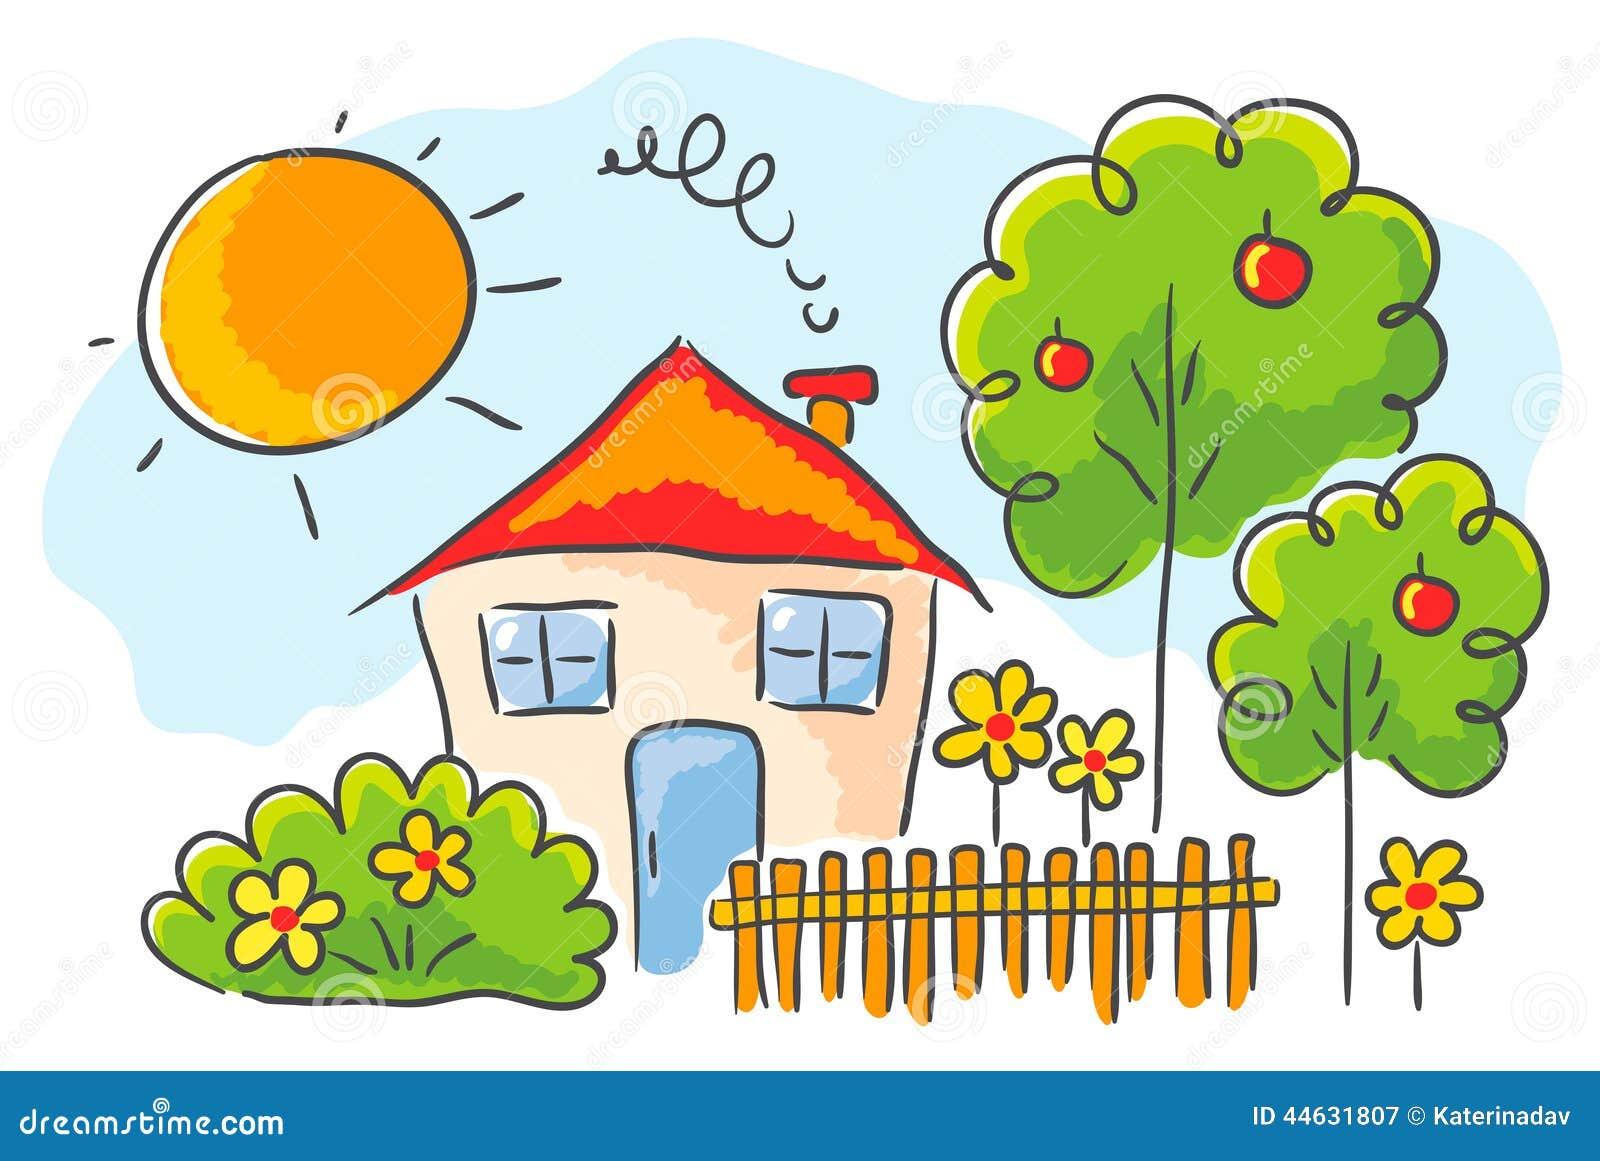 Dibujo del s del ni o de una casa ilustraci n del vector for Arriendo casa para jardin infantil